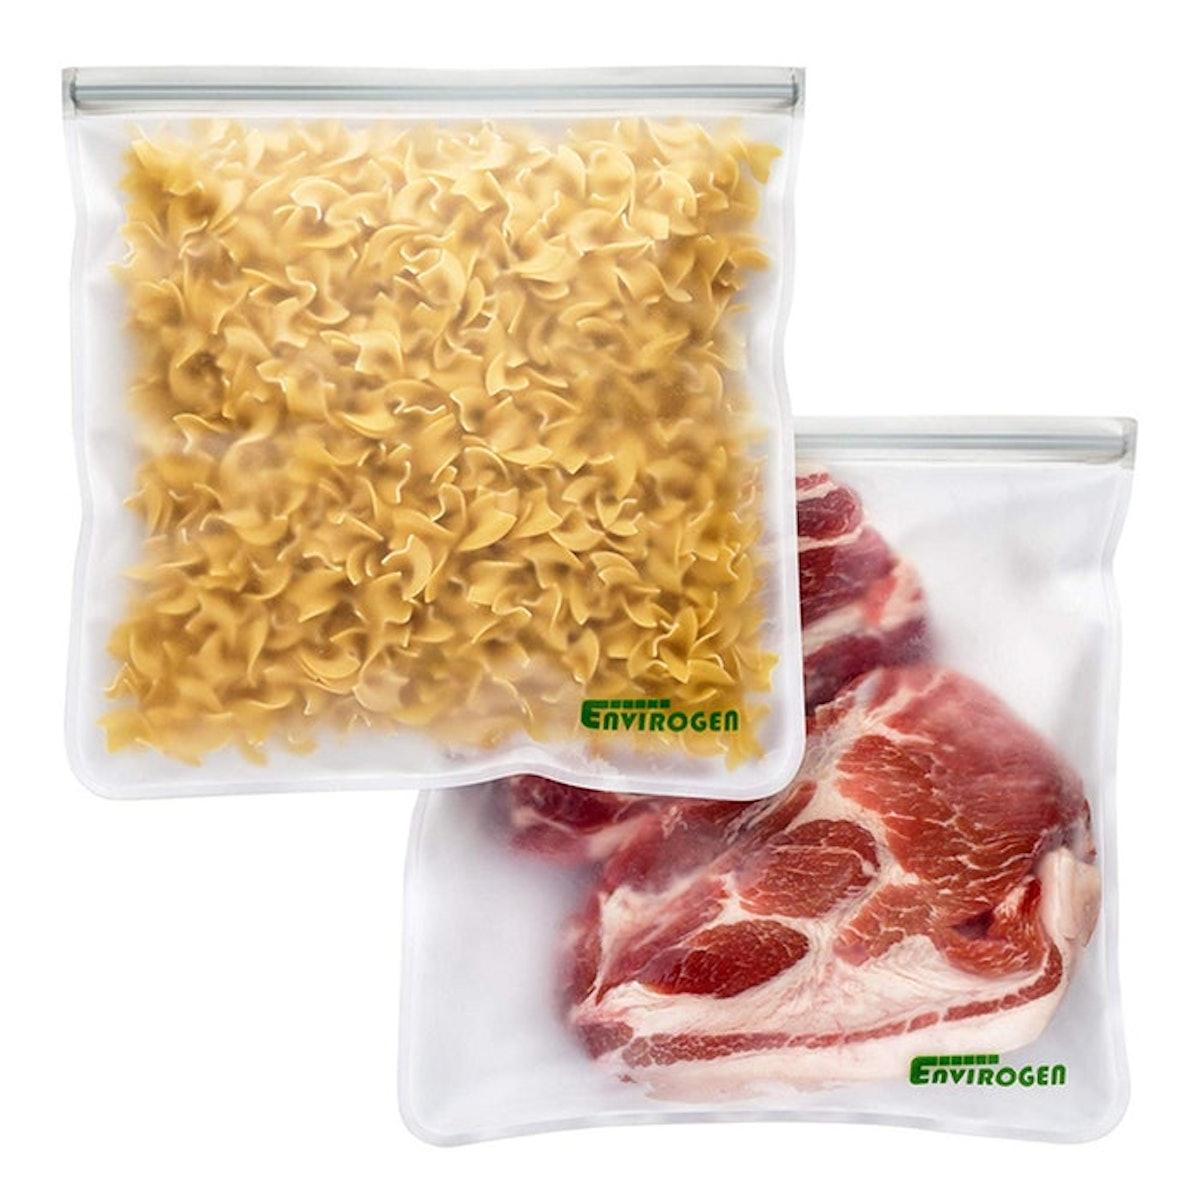 Envirogen Reusable Gallon Storage Bags (2-Pack)